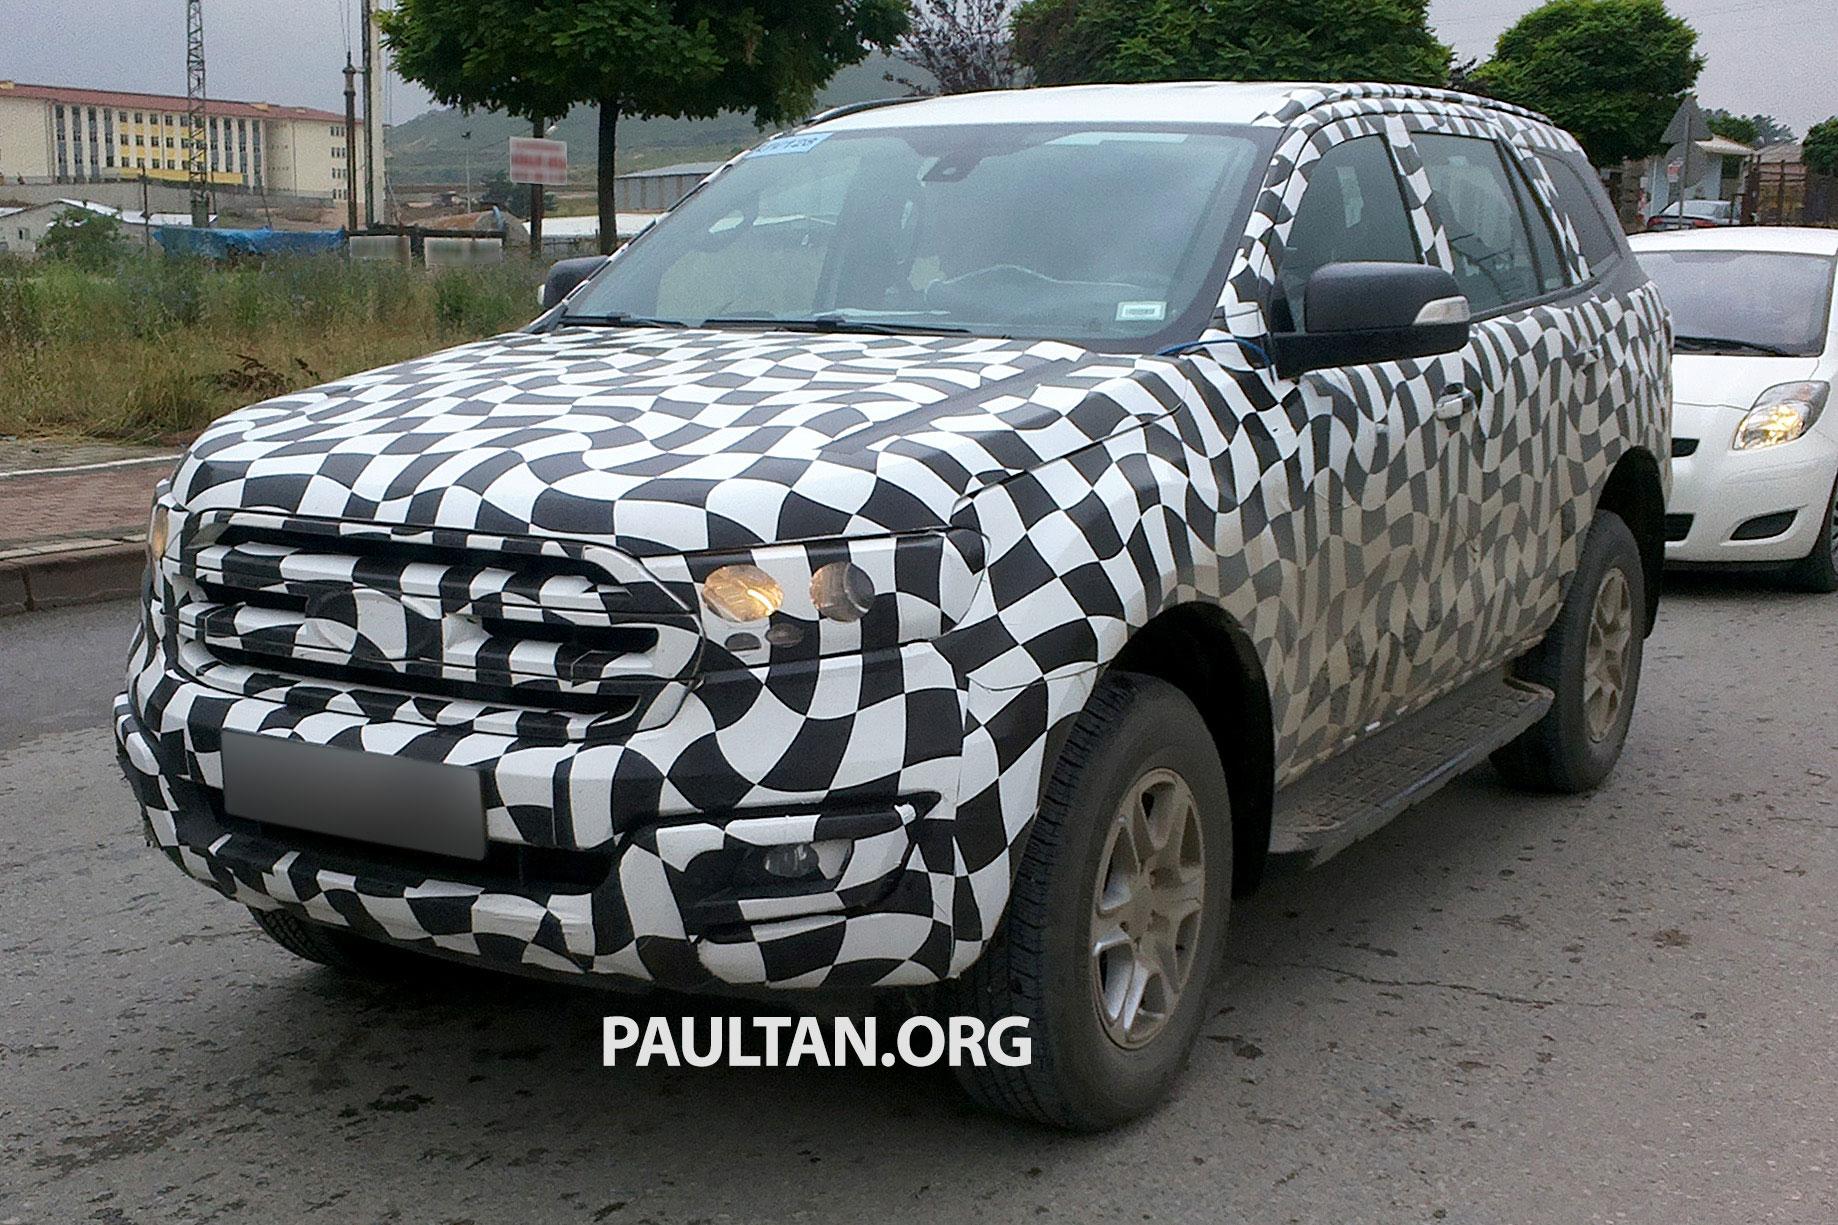 SPYSHOTS: Ford Ranger Facelift And New Ford Everest